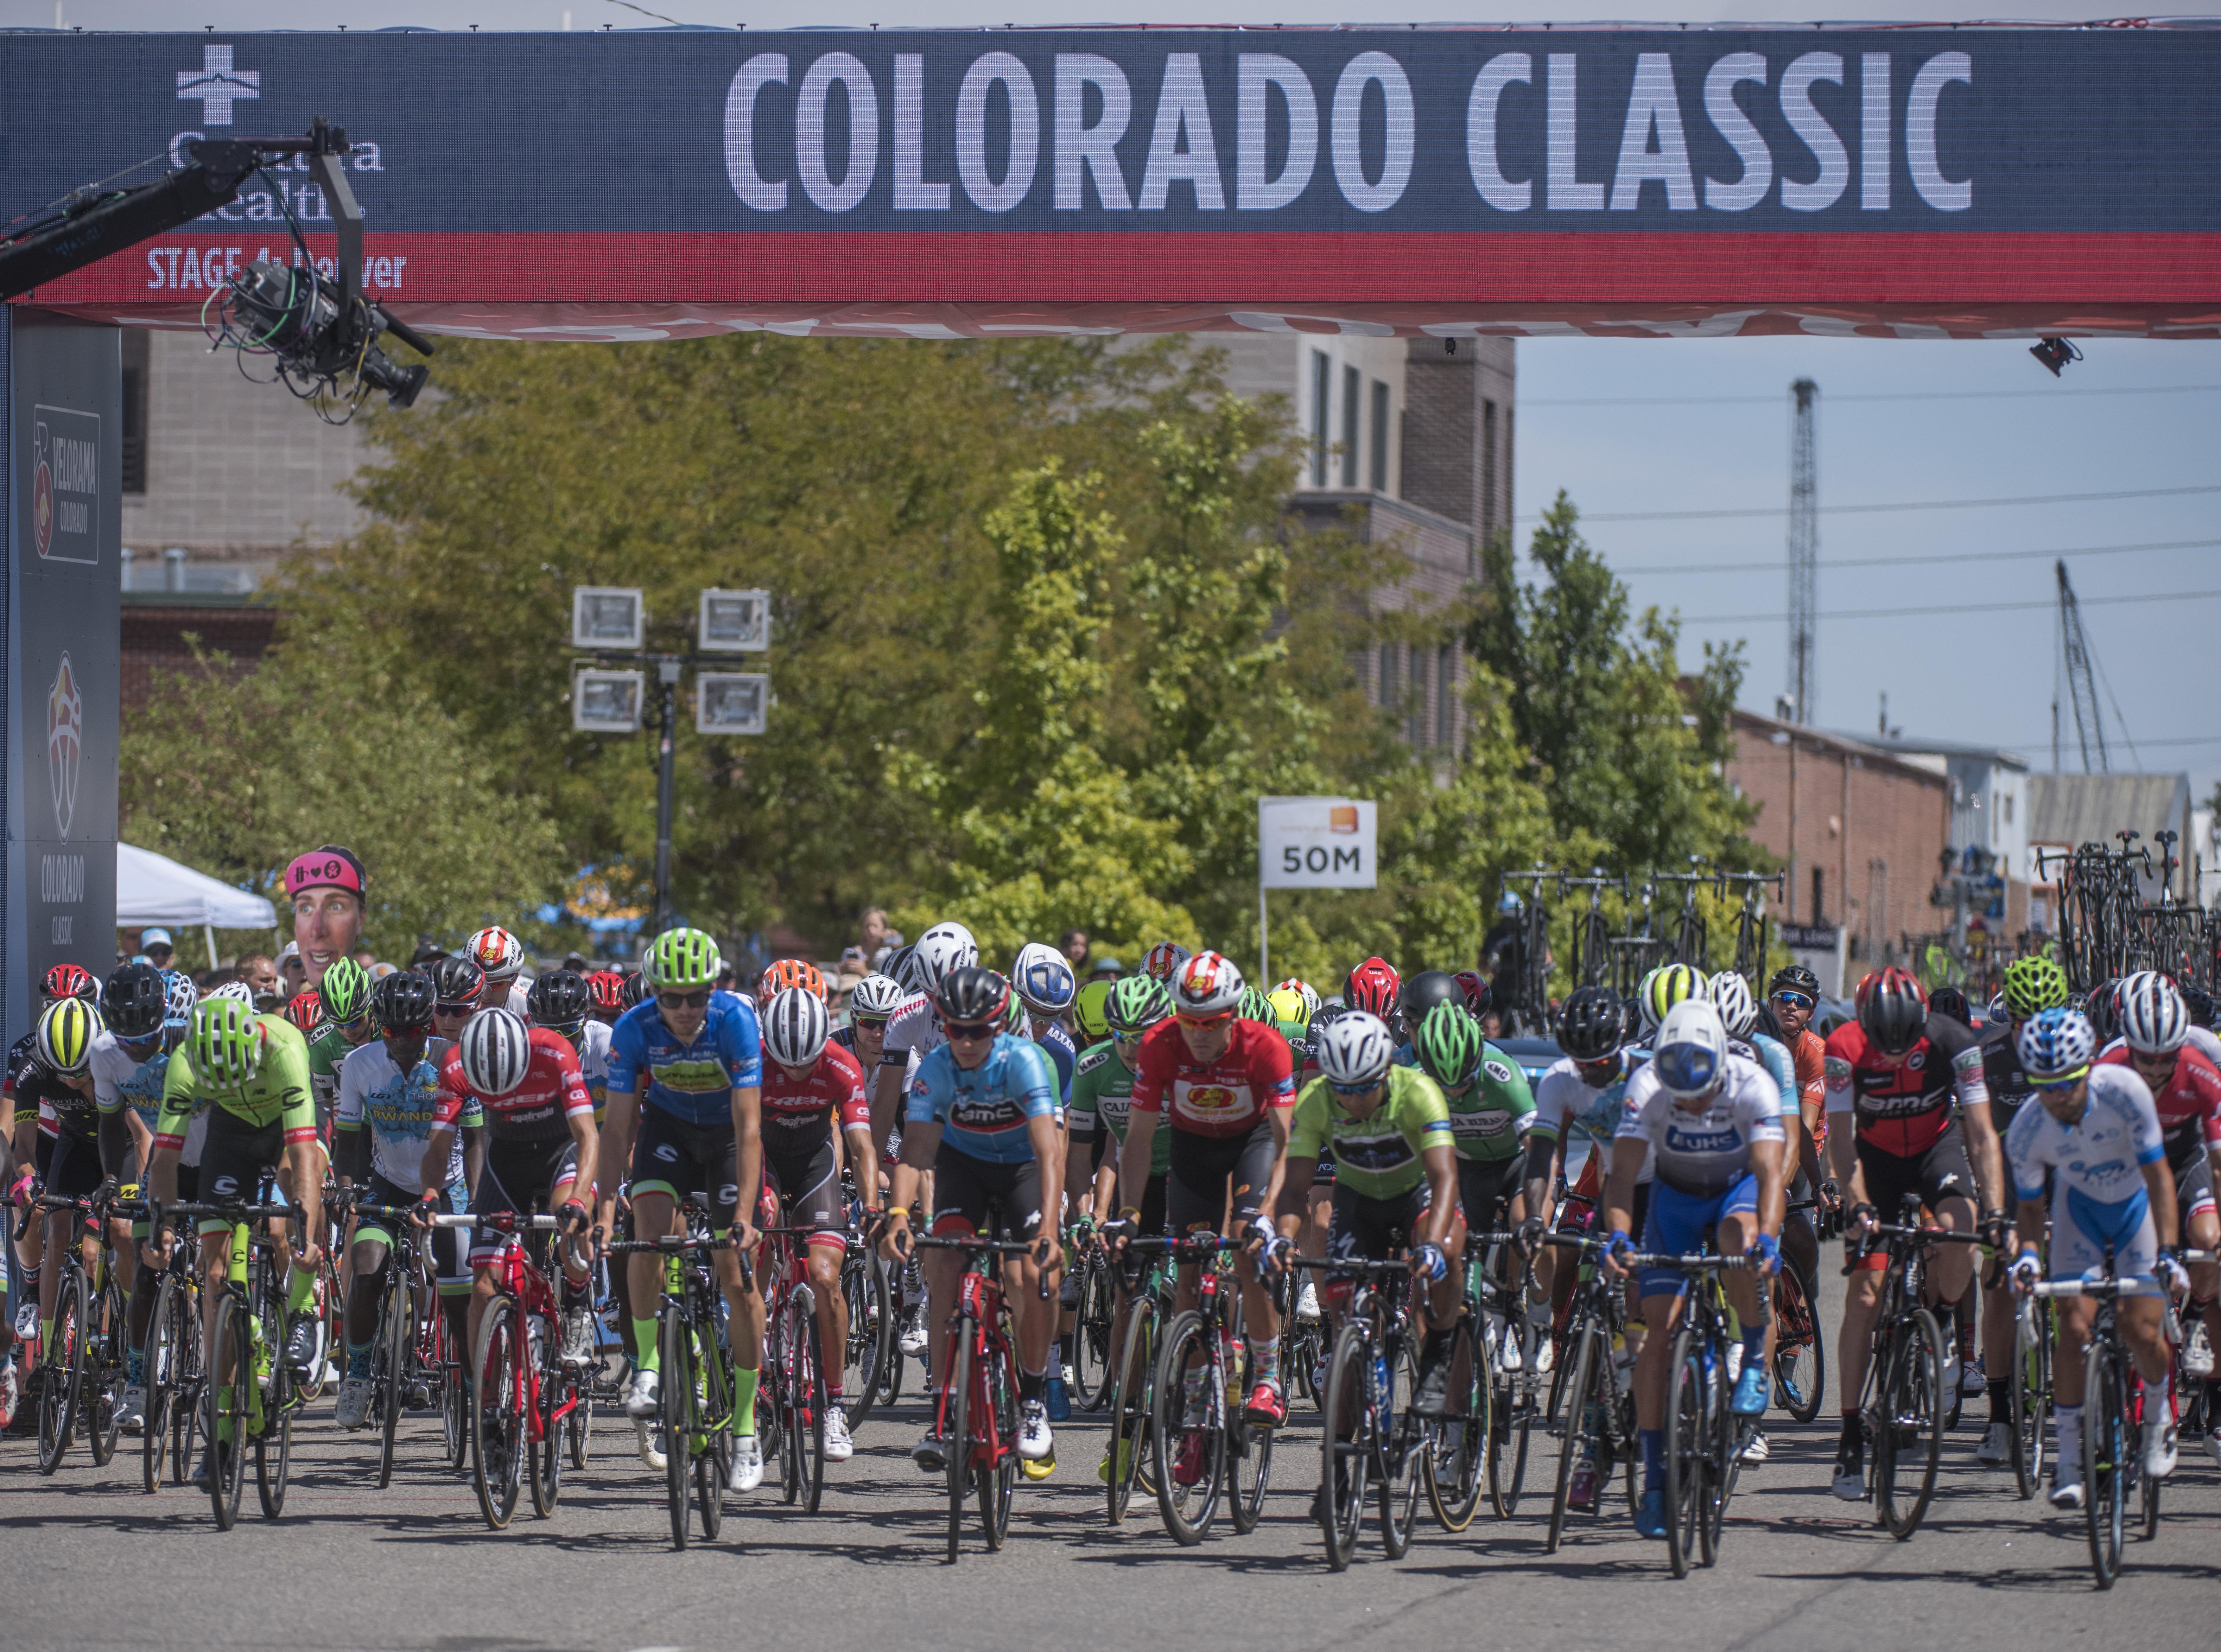 22008939a Colorado Classic 2018 Course Data · Velorama SUNDAY 72